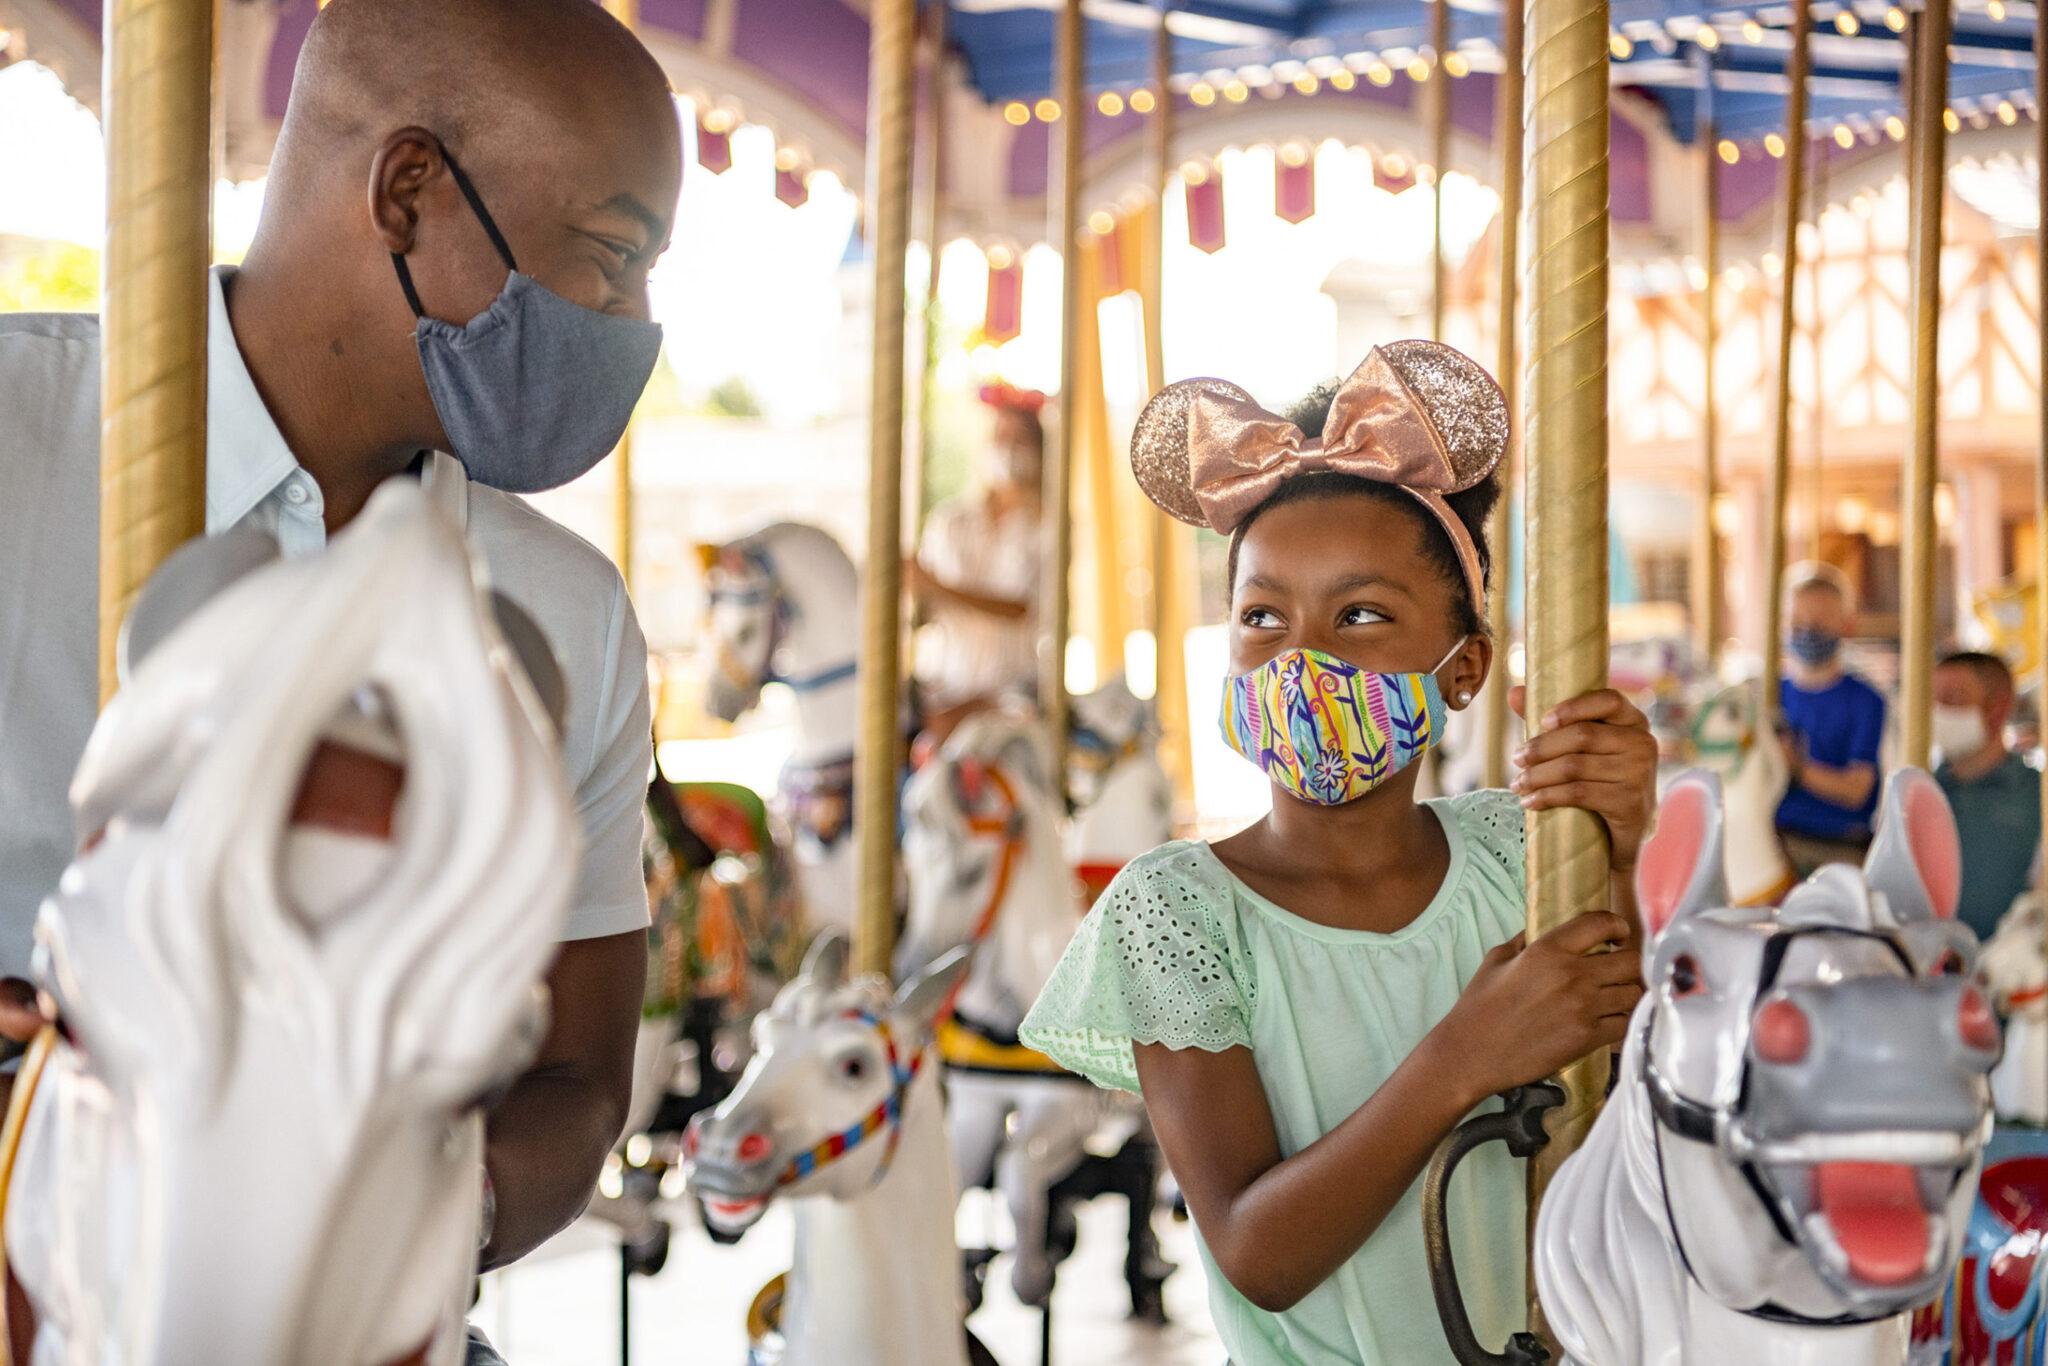 Walt Disney World Resort face coverings